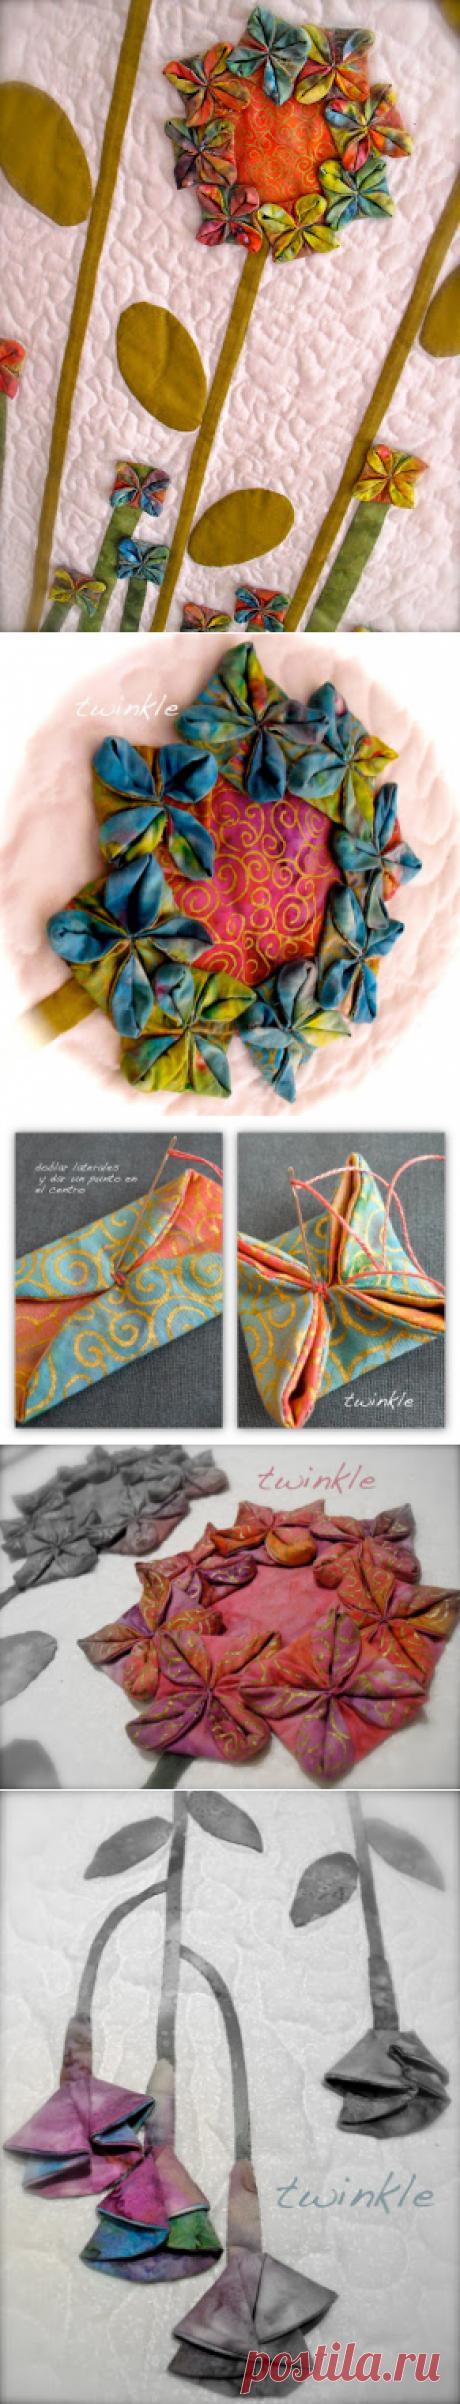 "TWINKLE PATCHWORK: Tutorial ""Origami"""